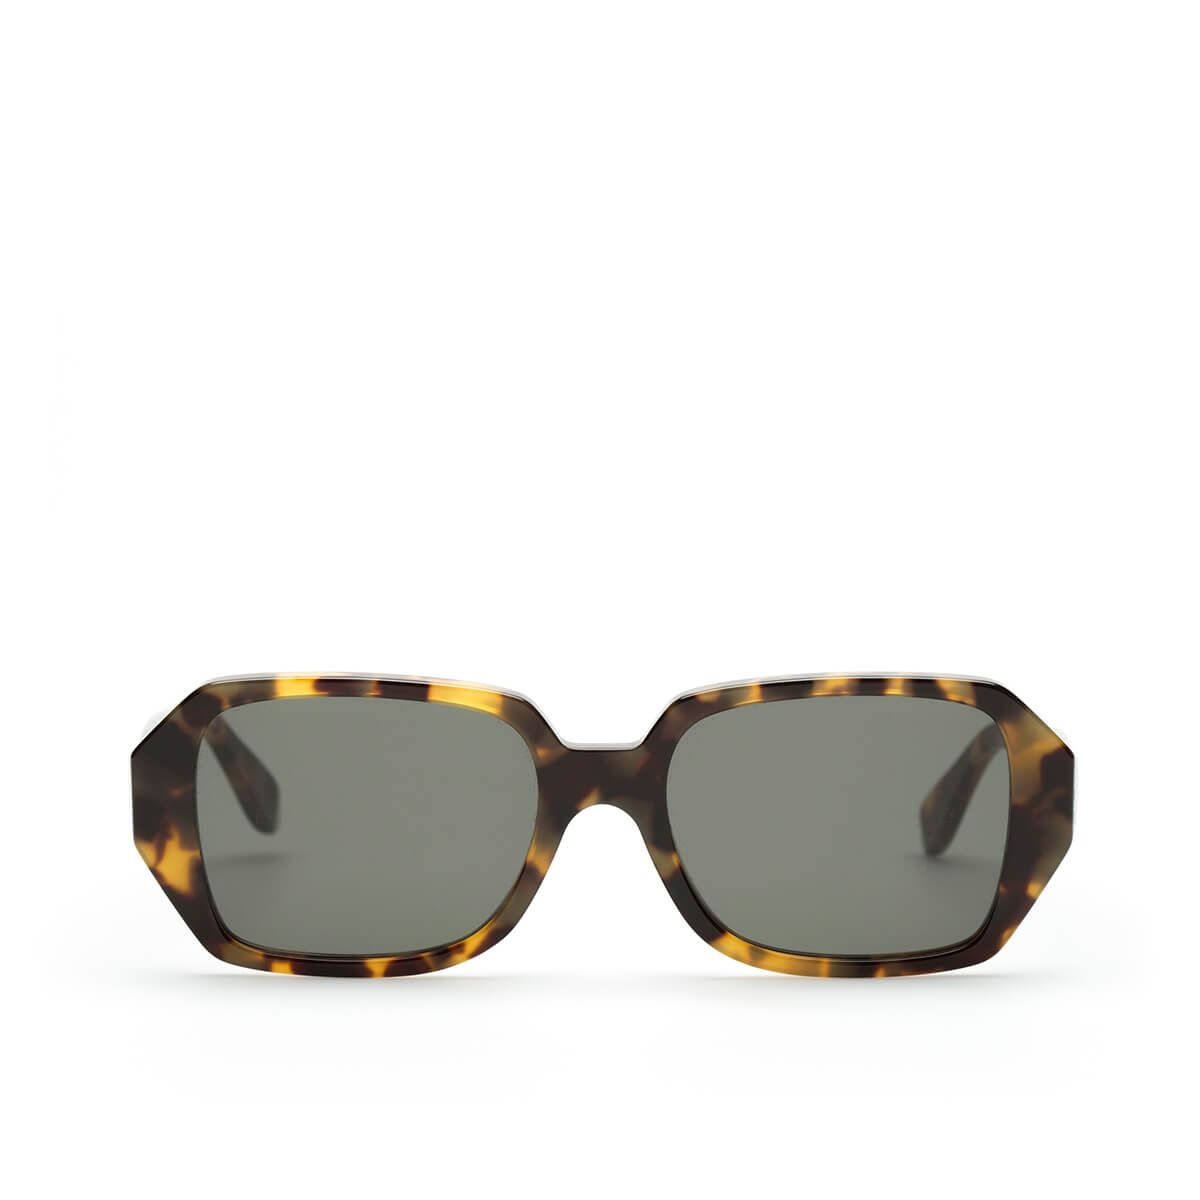 RETROSUPERFUTURE Limone Sunglasses